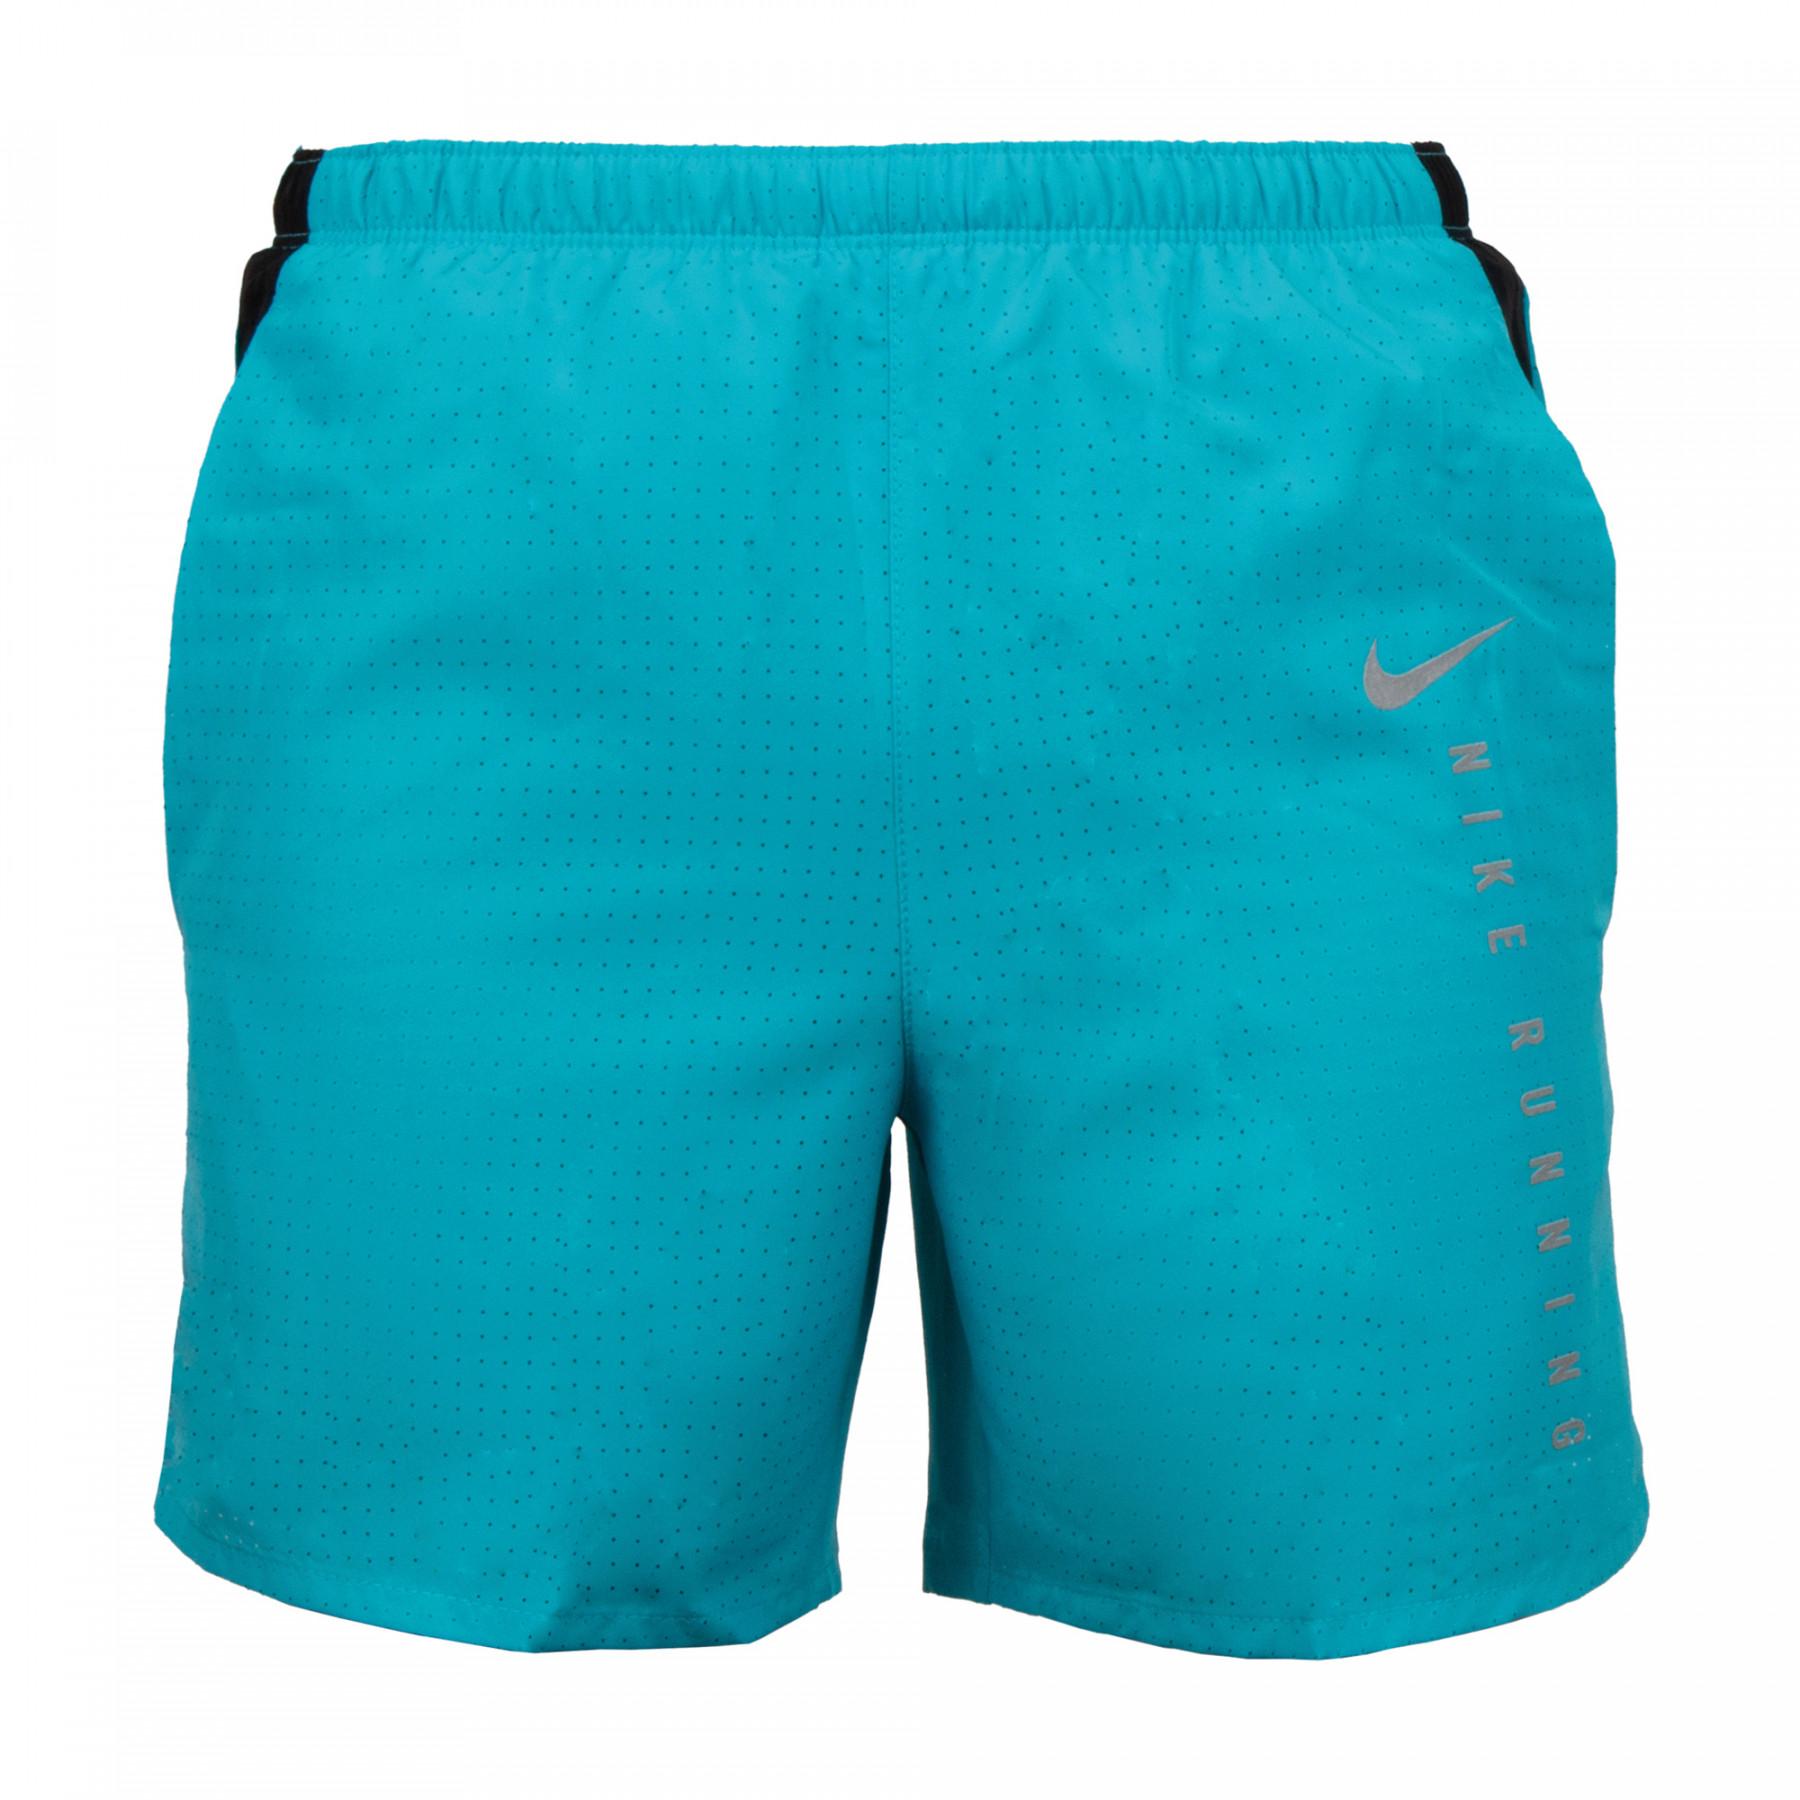 Blauw runningshort Nike Challenger Run Division - DA1310-447